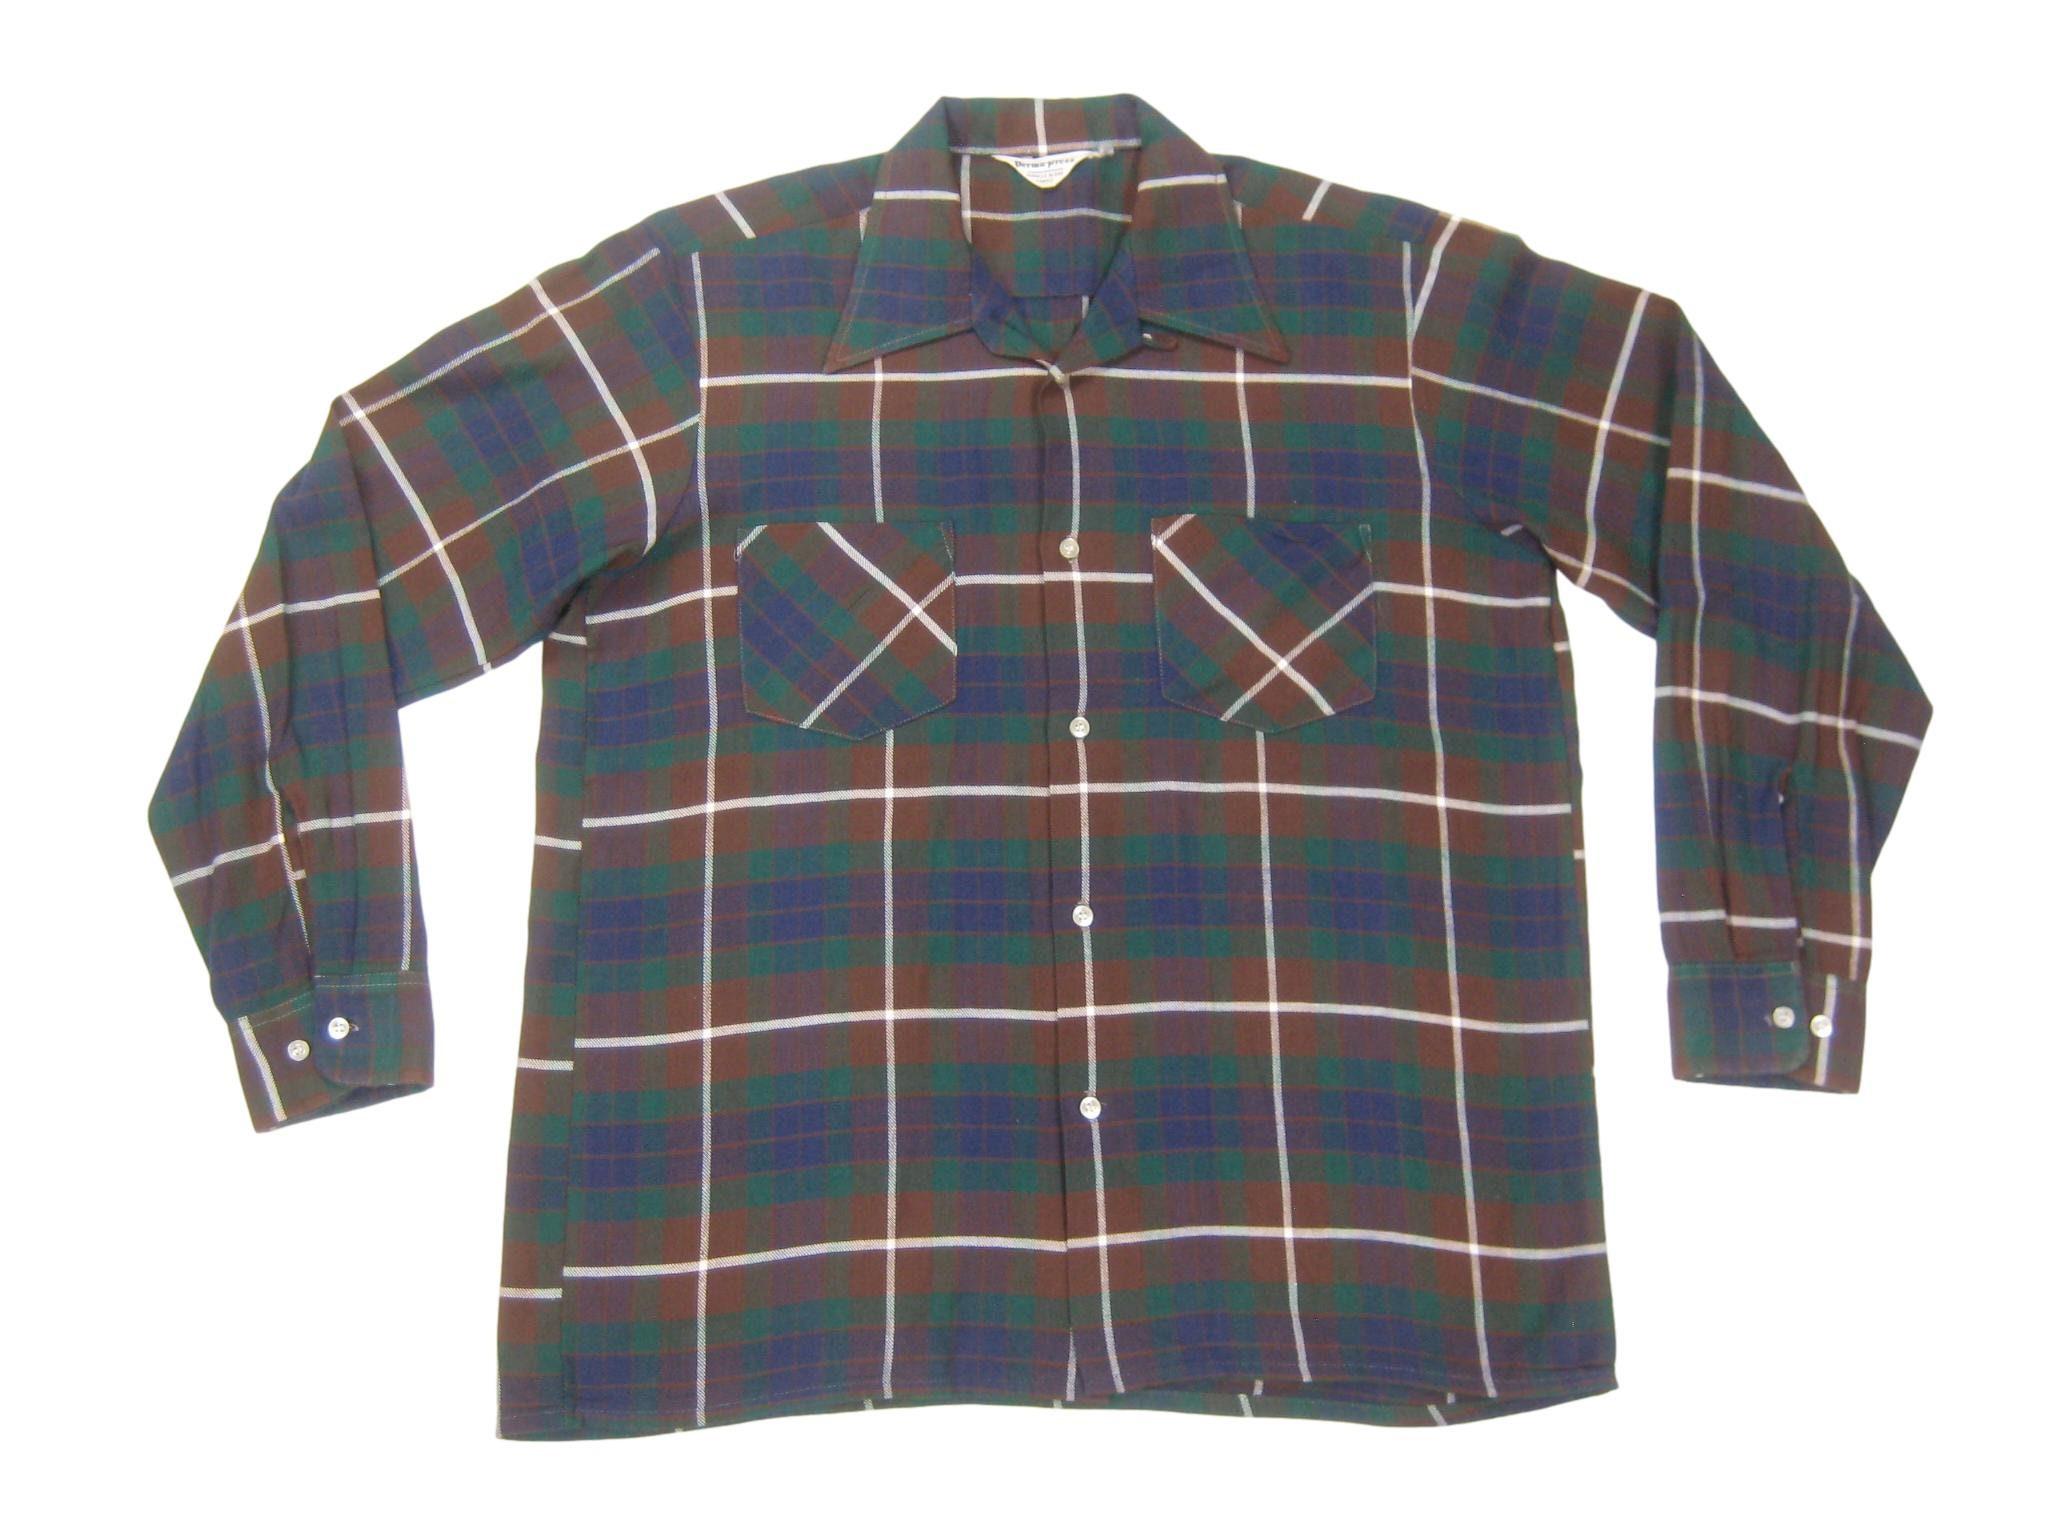 1960s – 70s Men's Ties | Skinny Ties, Slim Ties 1960S Loop Collar Sport Shirt Vintage Retro Mens Windowpane Check Plaid Long Sleeve Button Up MMediumLLarge $55.00 AT vintagedancer.com